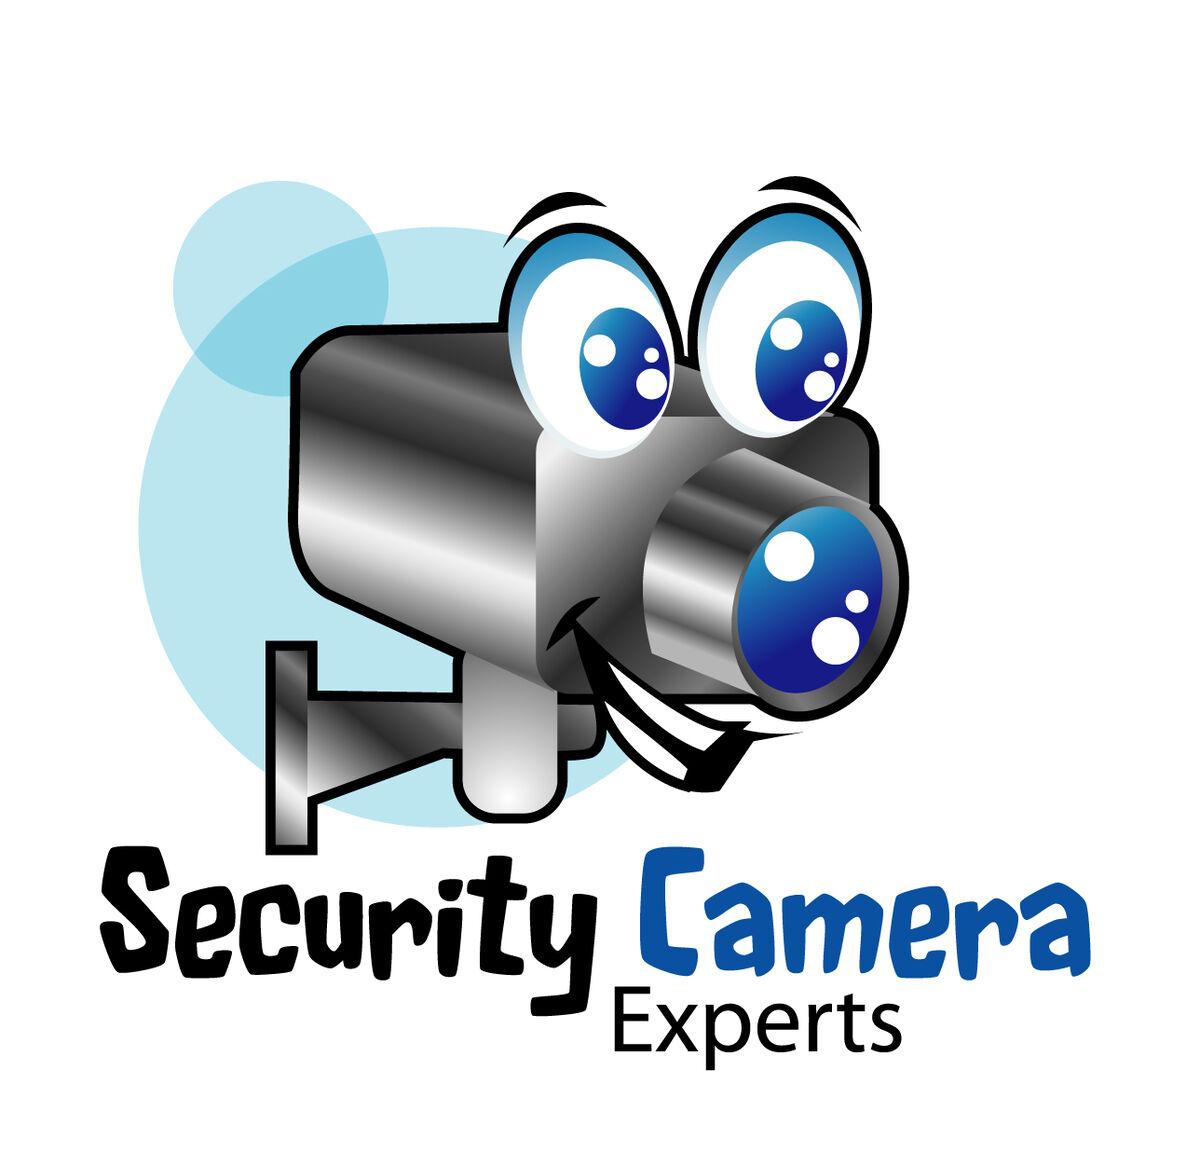 Security Camera Experts